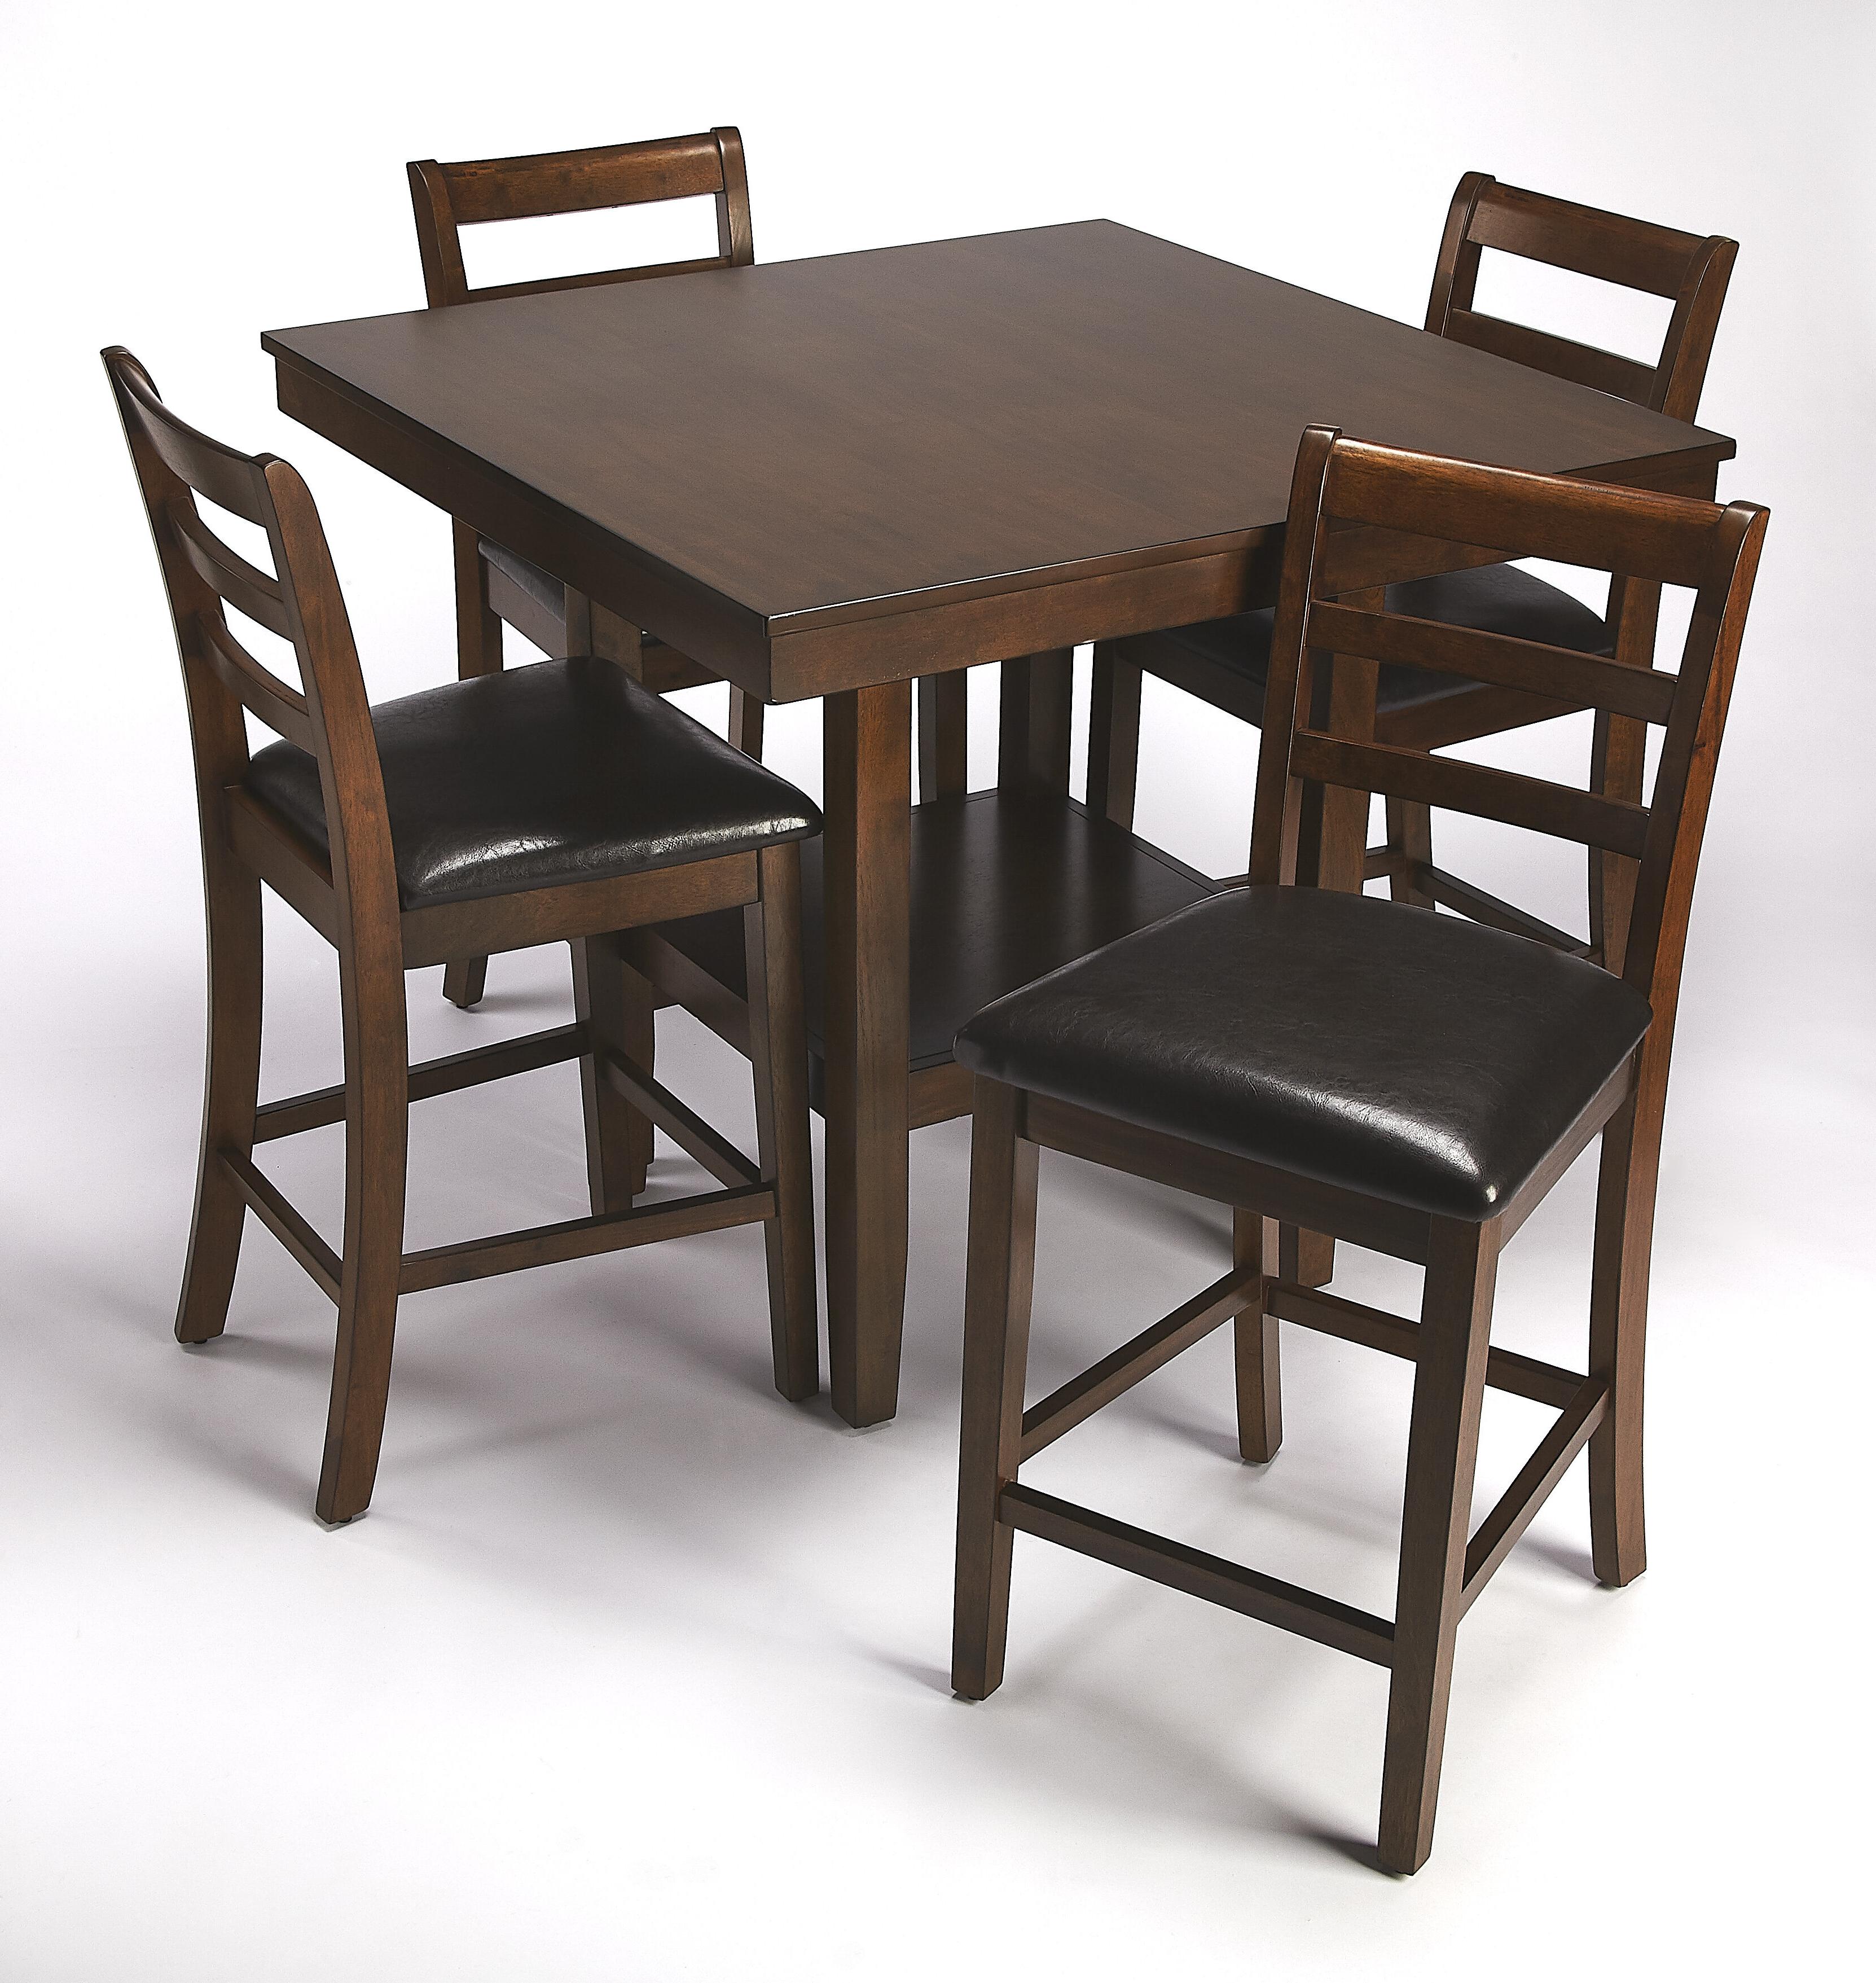 Sigler 5 Piece Dining Set Regarding Most Recent Emmeline 5 Piece Breakfast Nook Dining Sets (View 13 of 20)